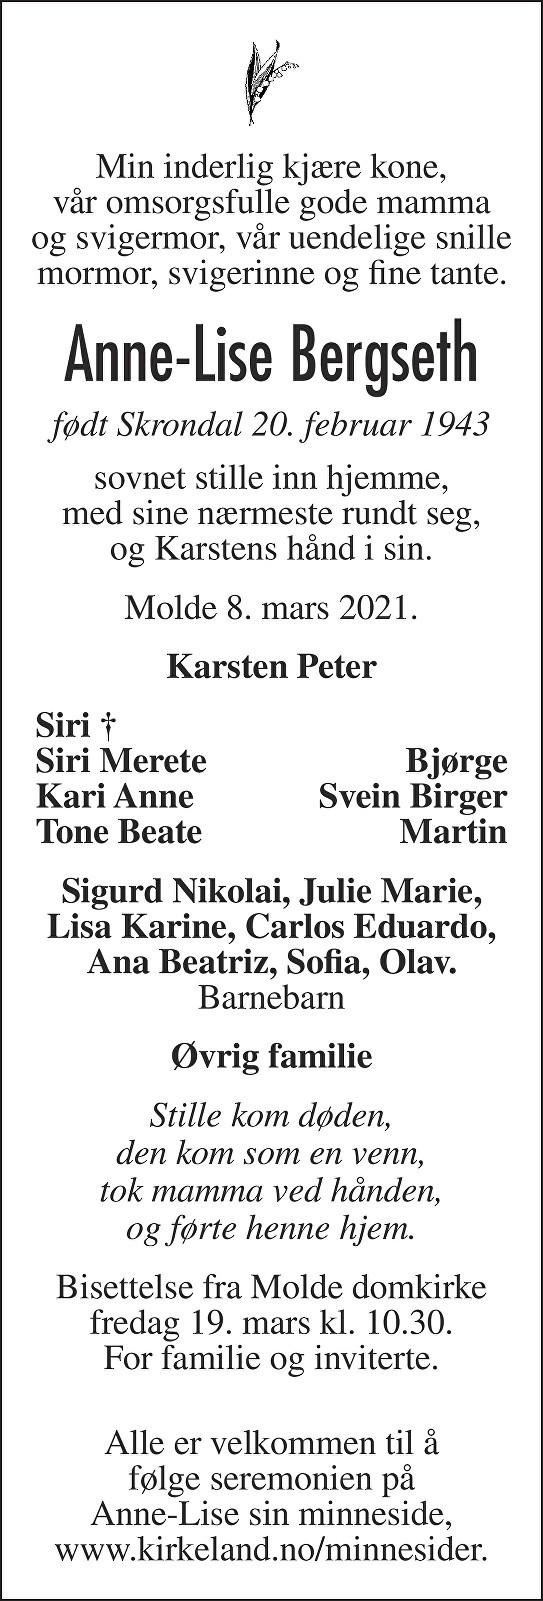 Anne-Lise Bergseth Dødsannonse